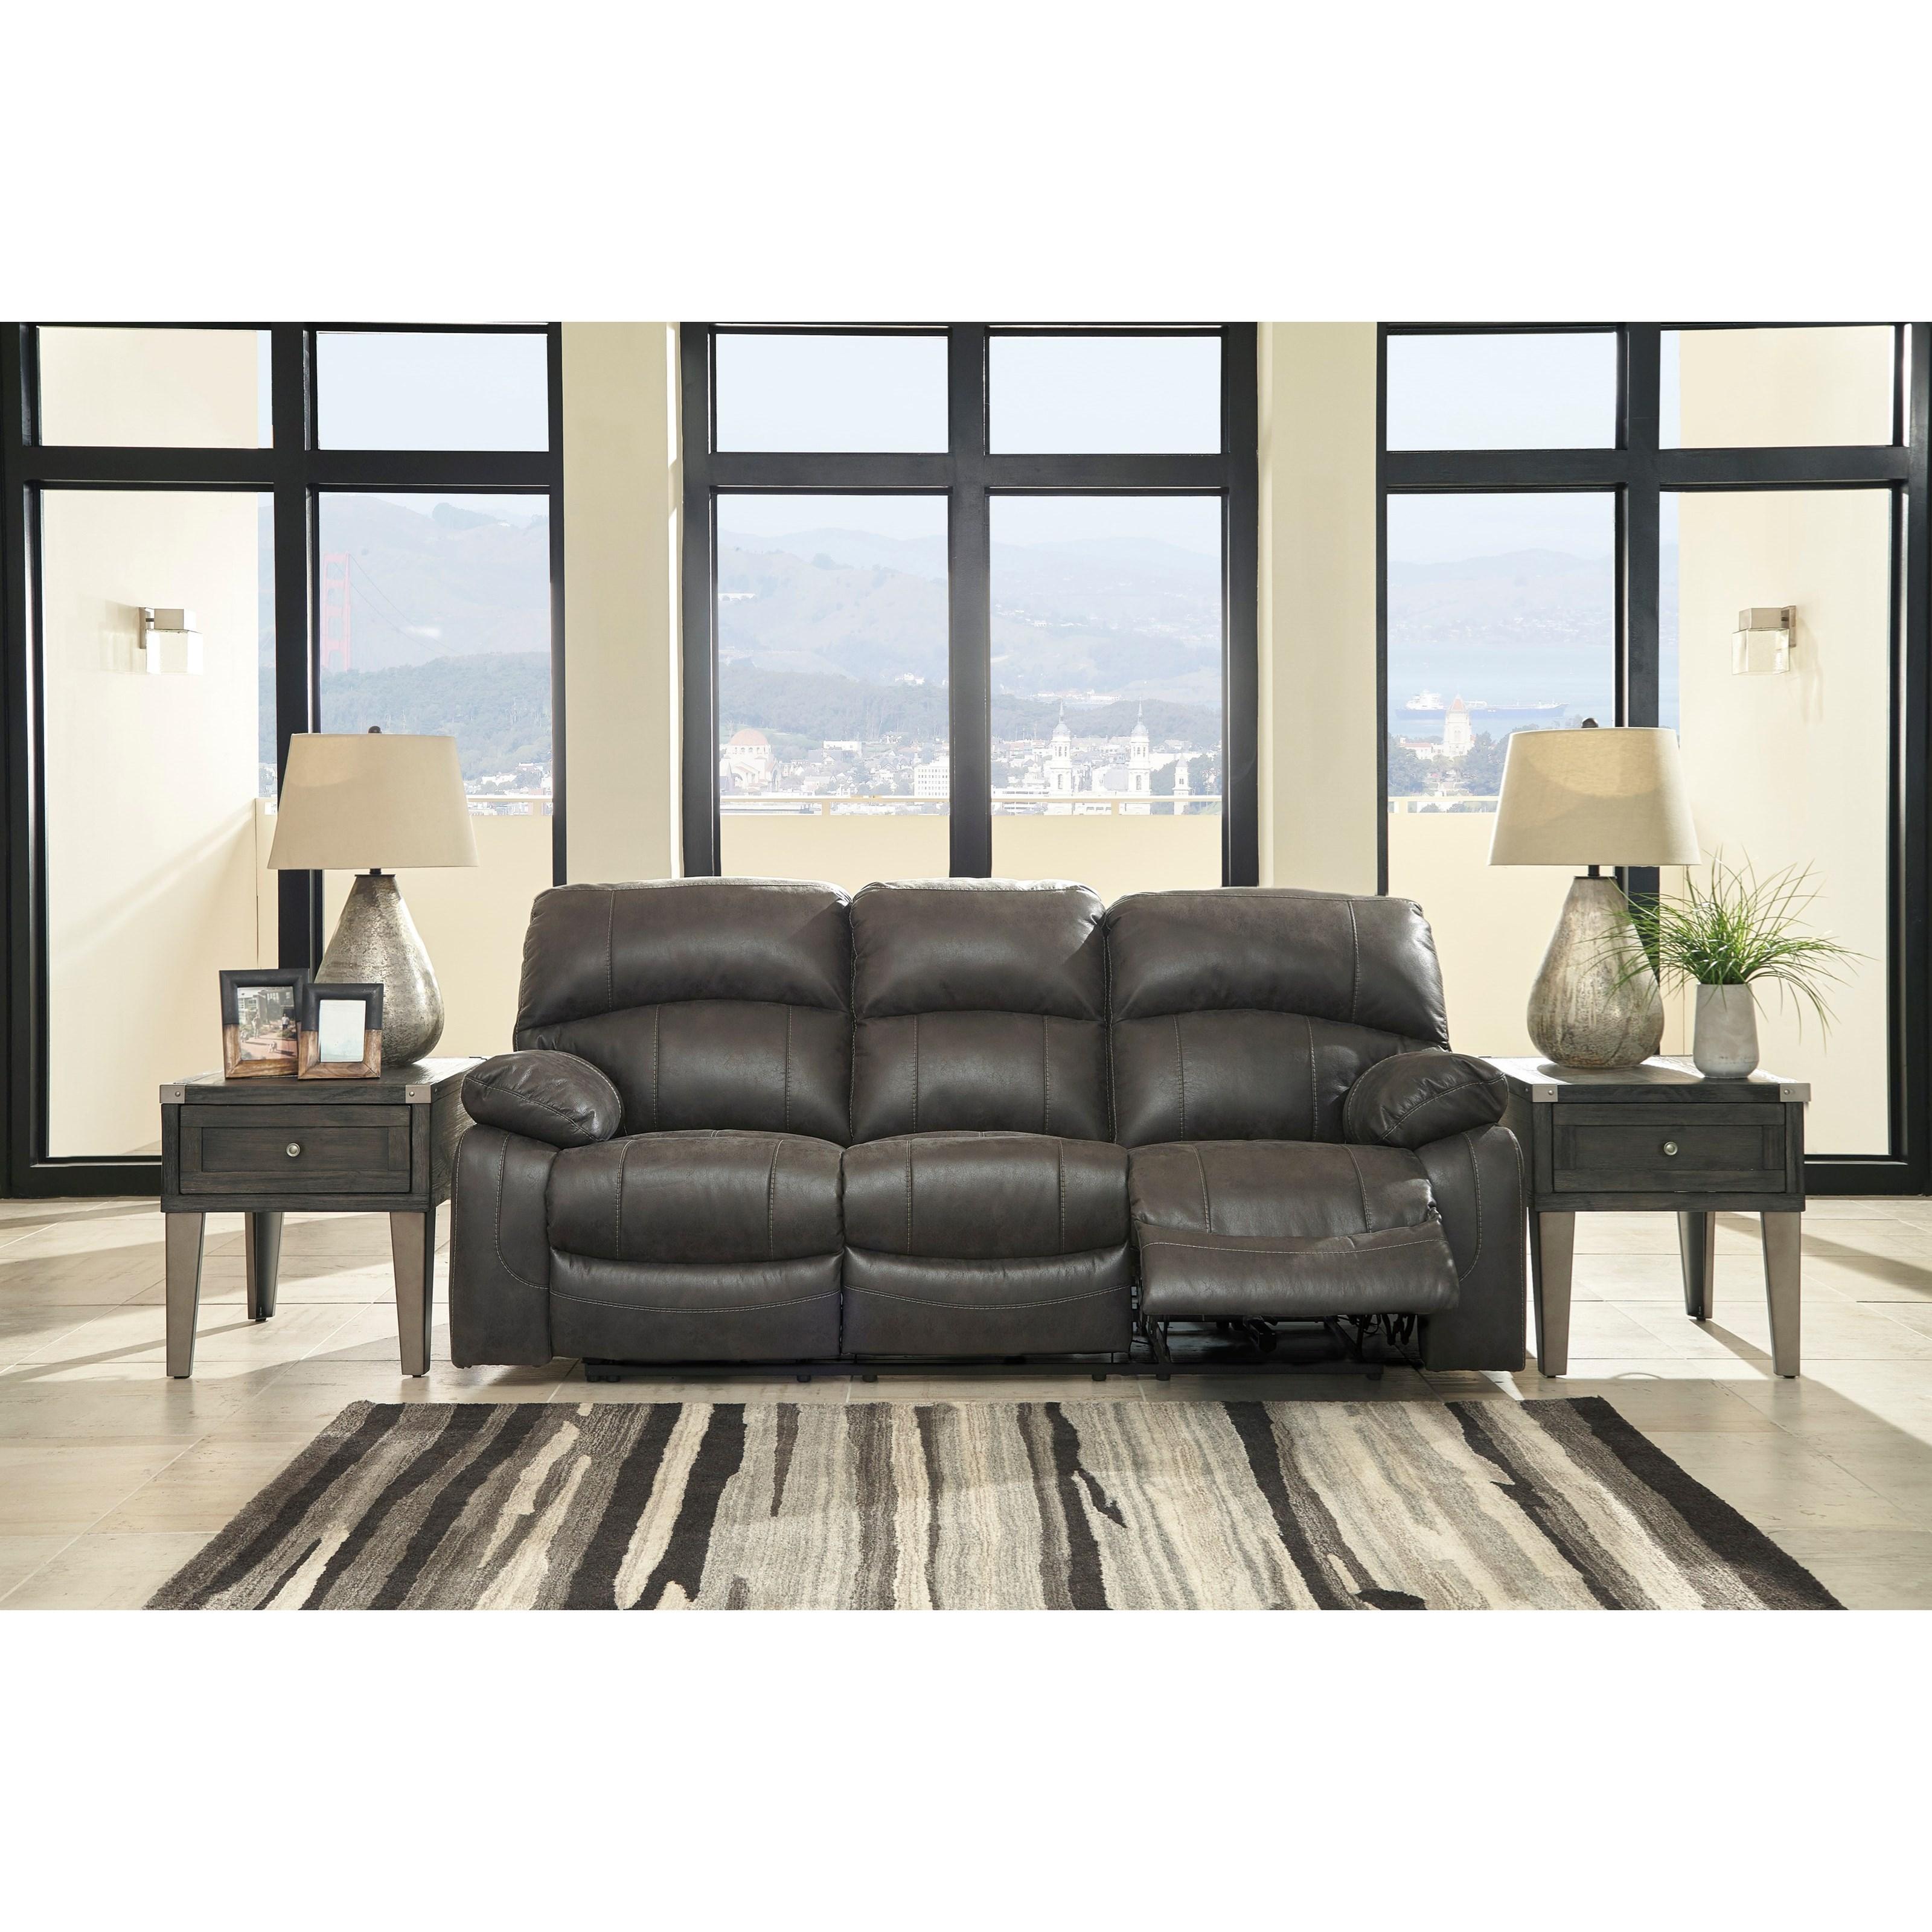 Ashley Furniture Store Kansas City: Signature Design By Ashley Dunwell Faux Leather Power